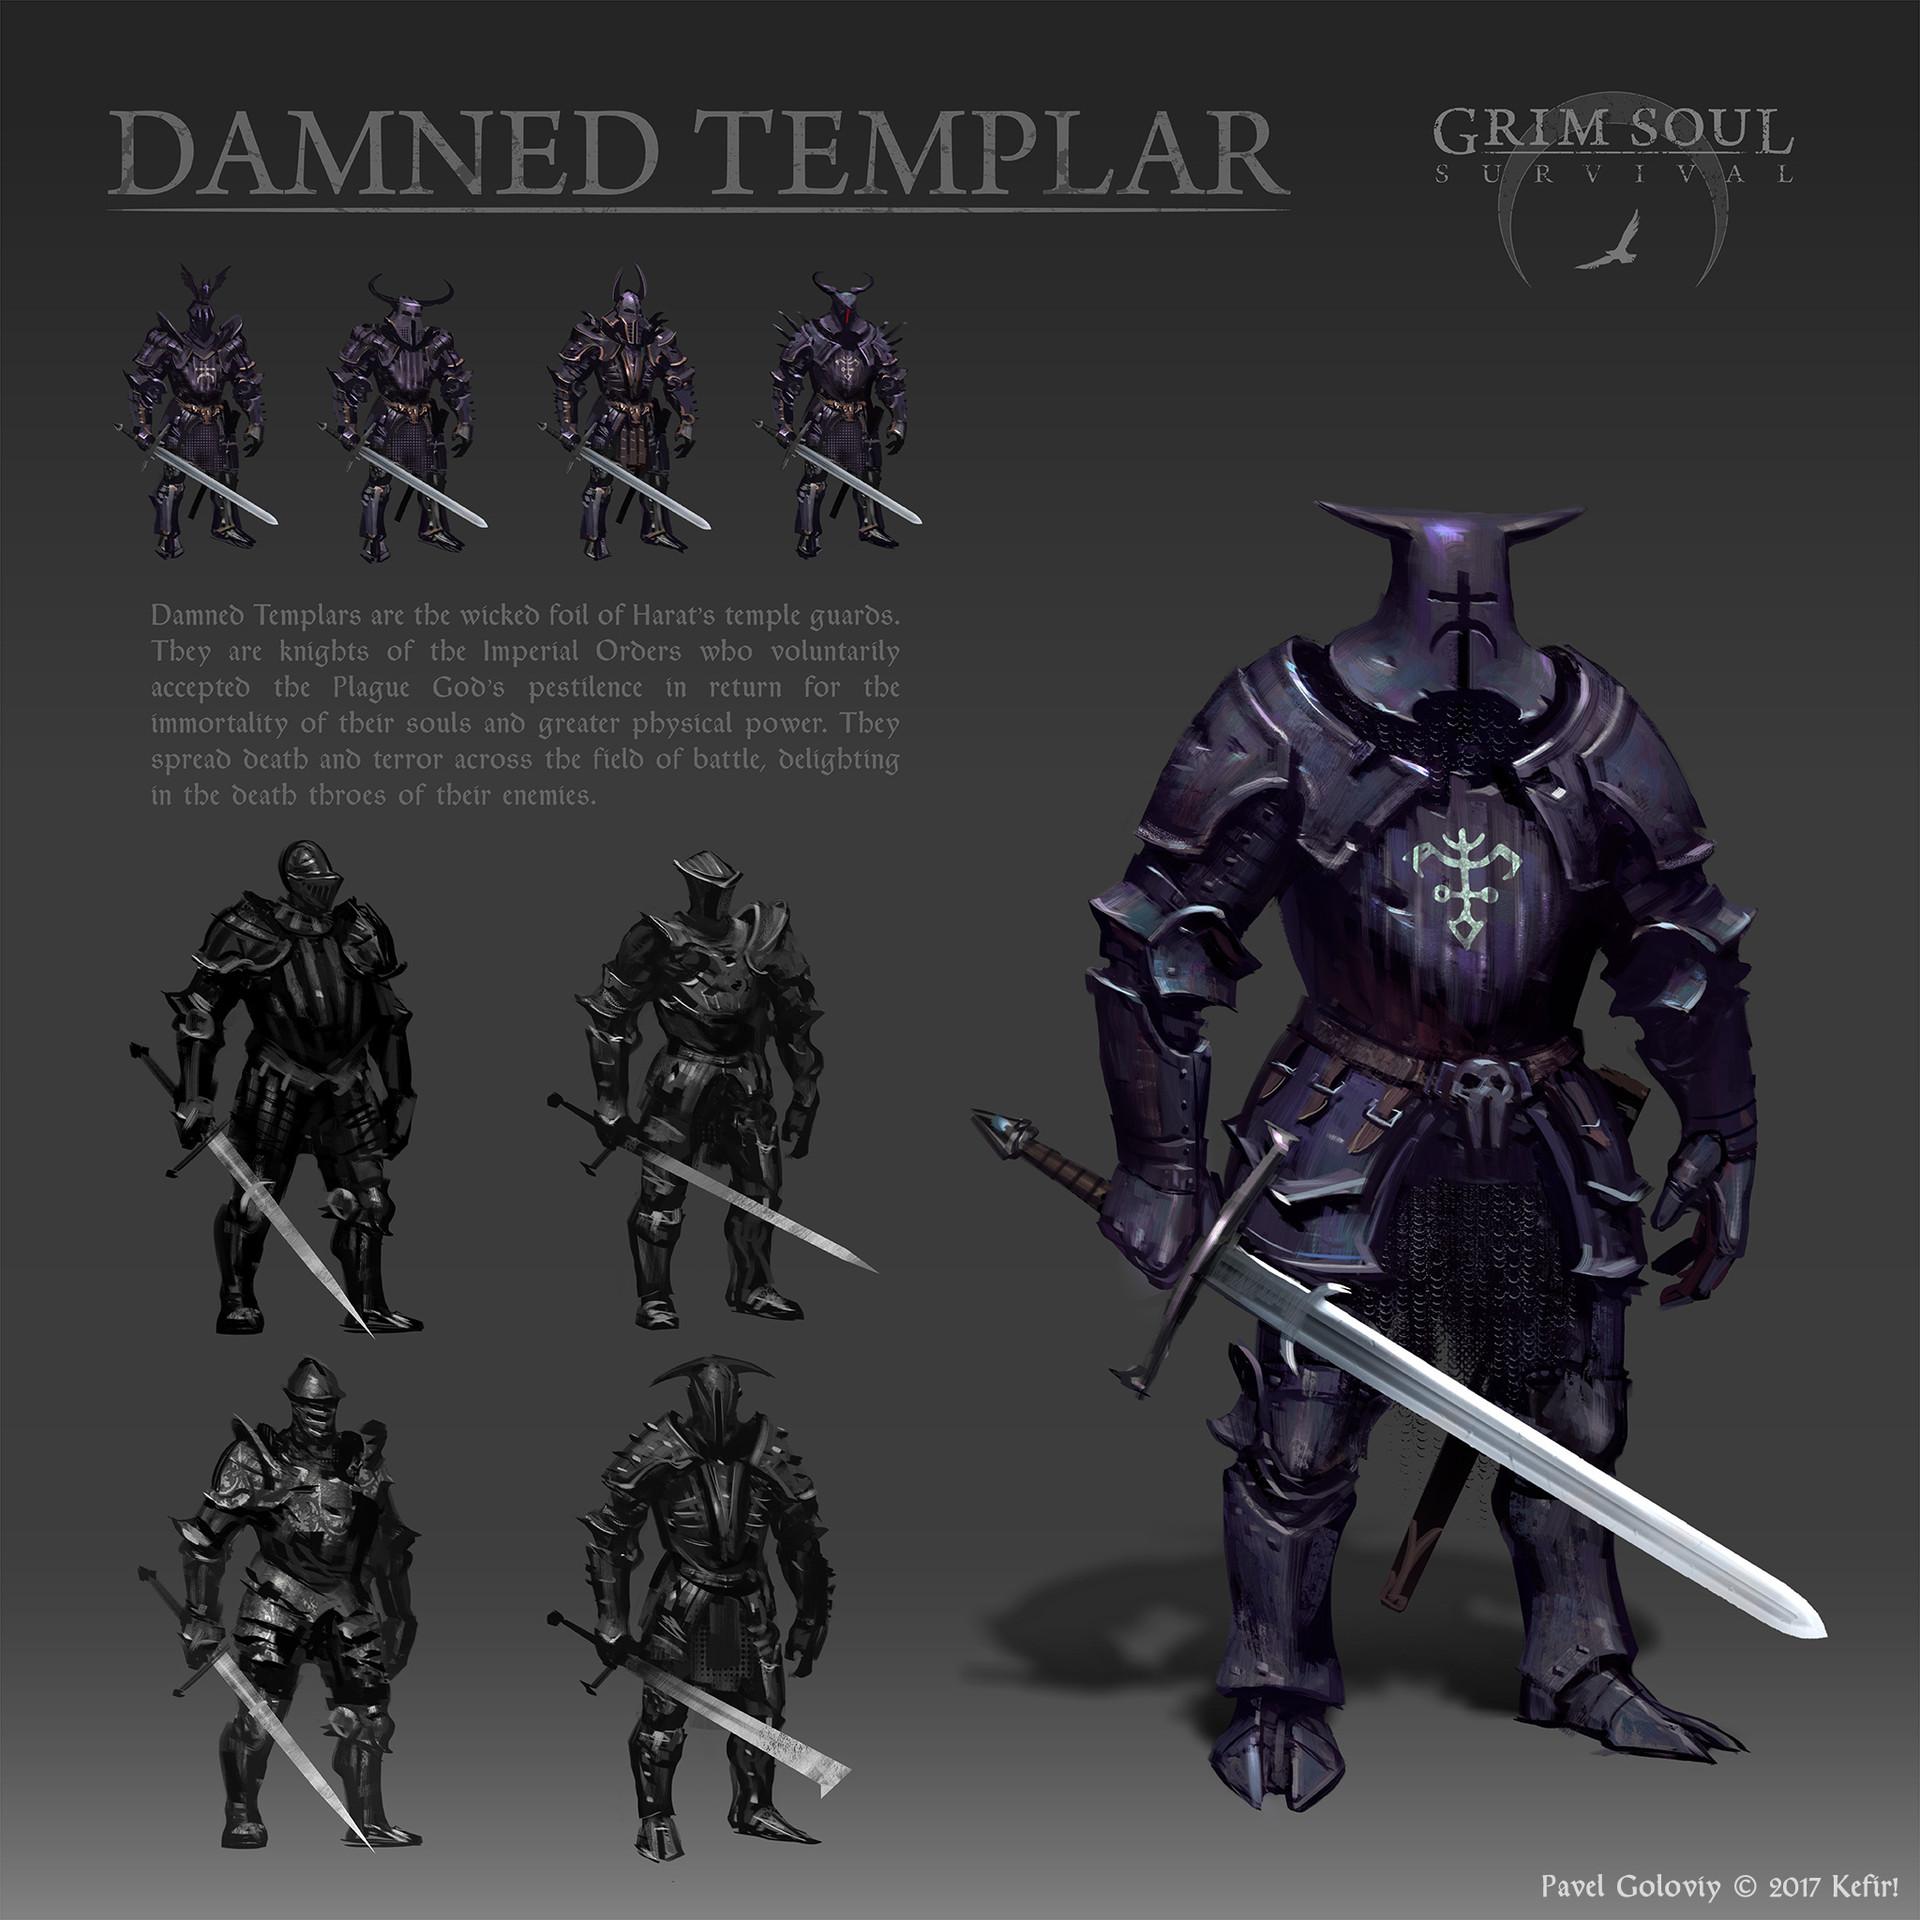 Damned Templar